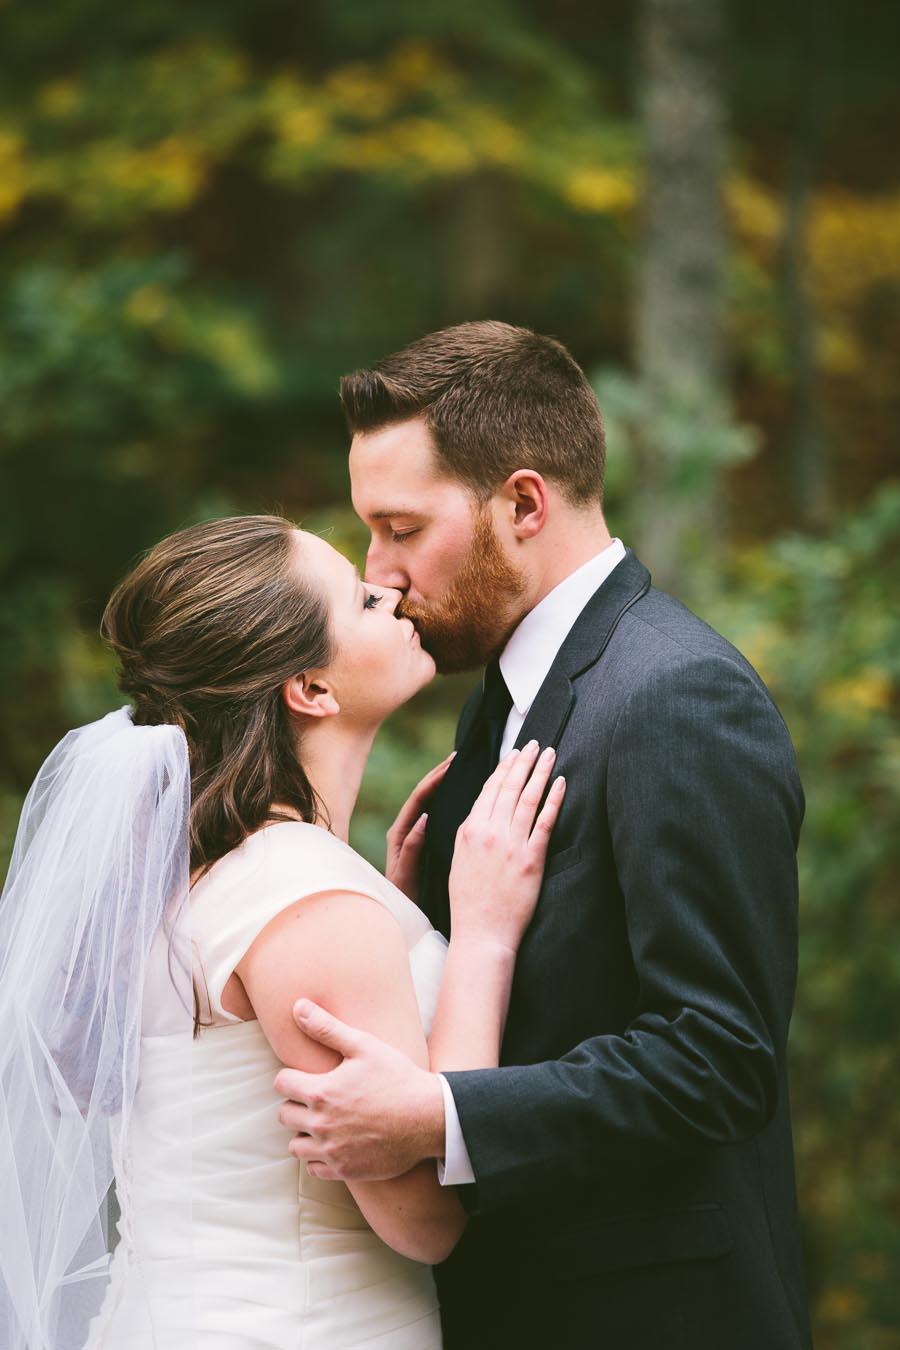 landolls-mohican-castle-wedding-photography-26.jpg